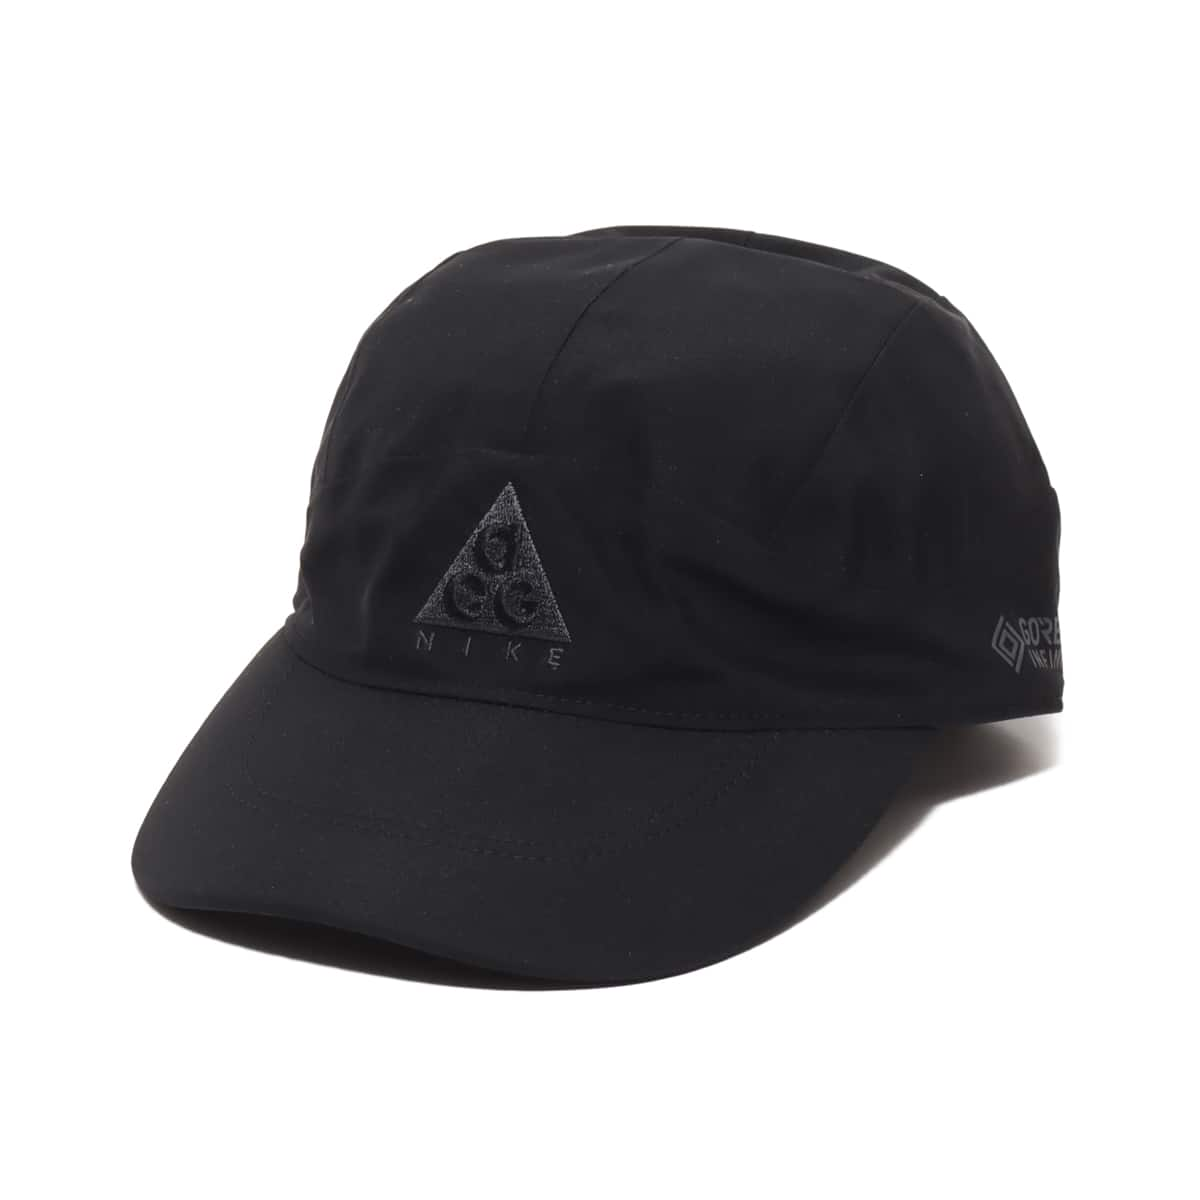 NIKE U NRG TLWD CAP ACG QS BLACK 20FA-I_photo_large